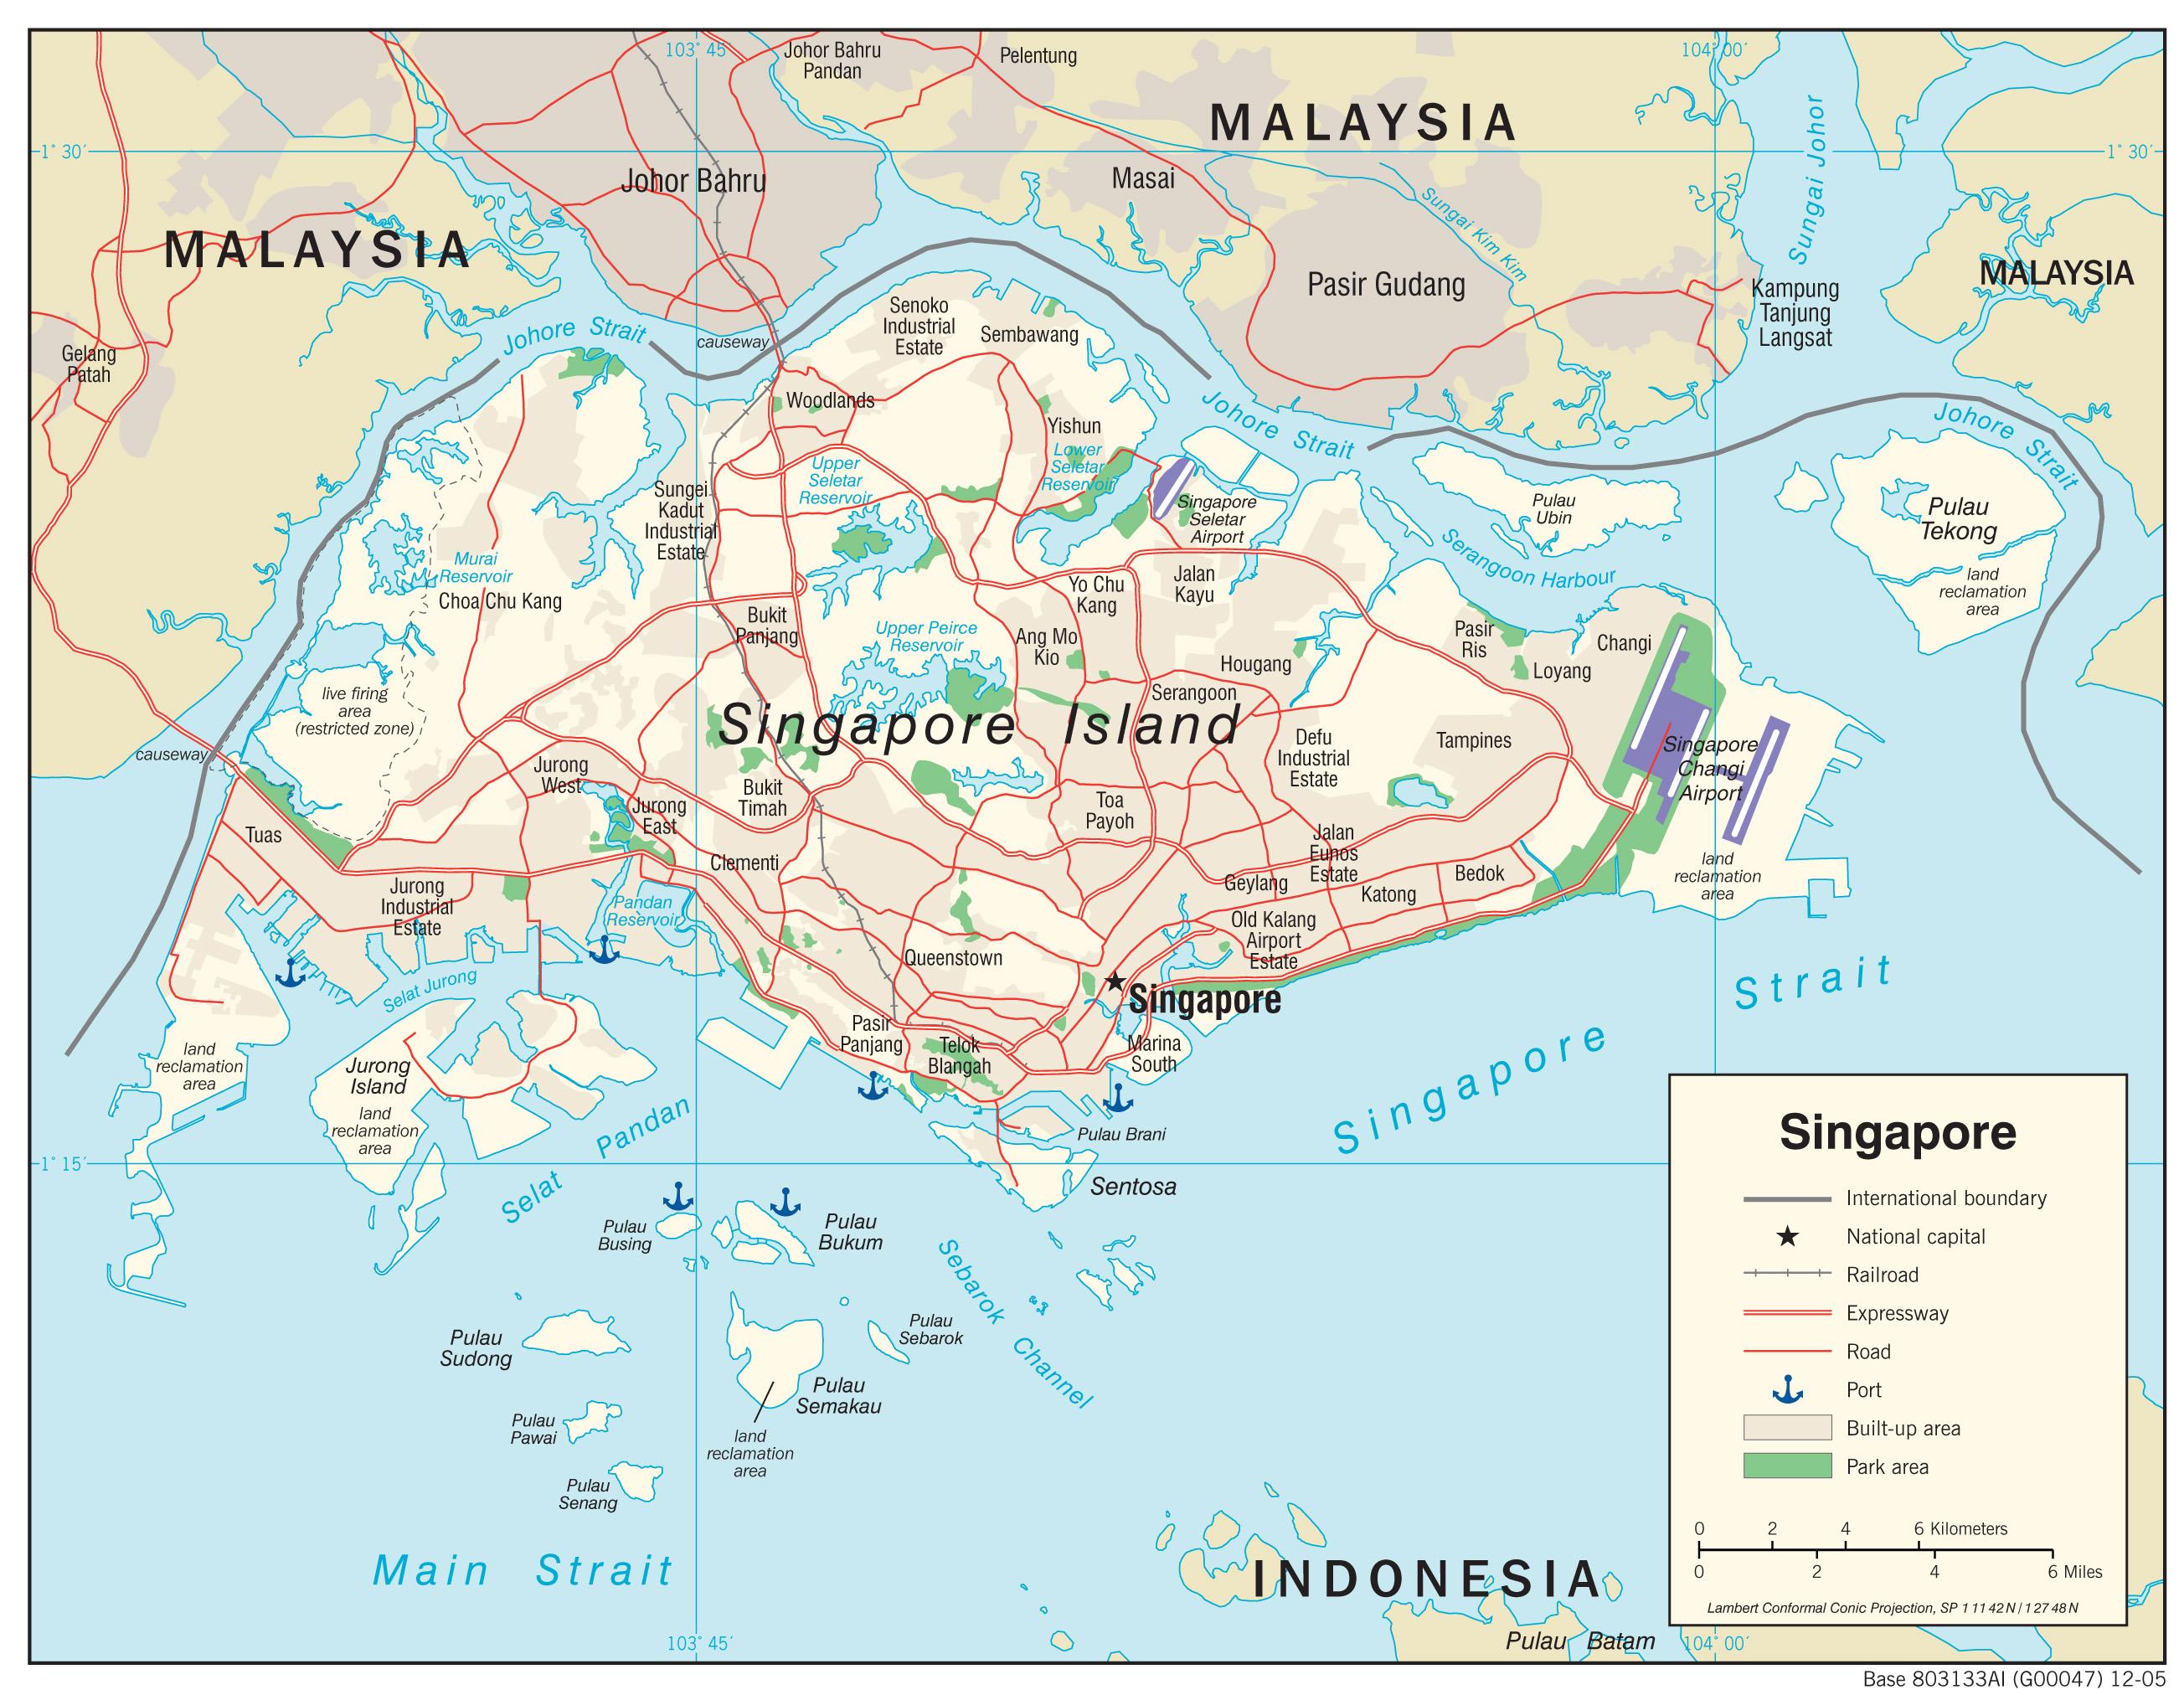 singapore_trans 2005